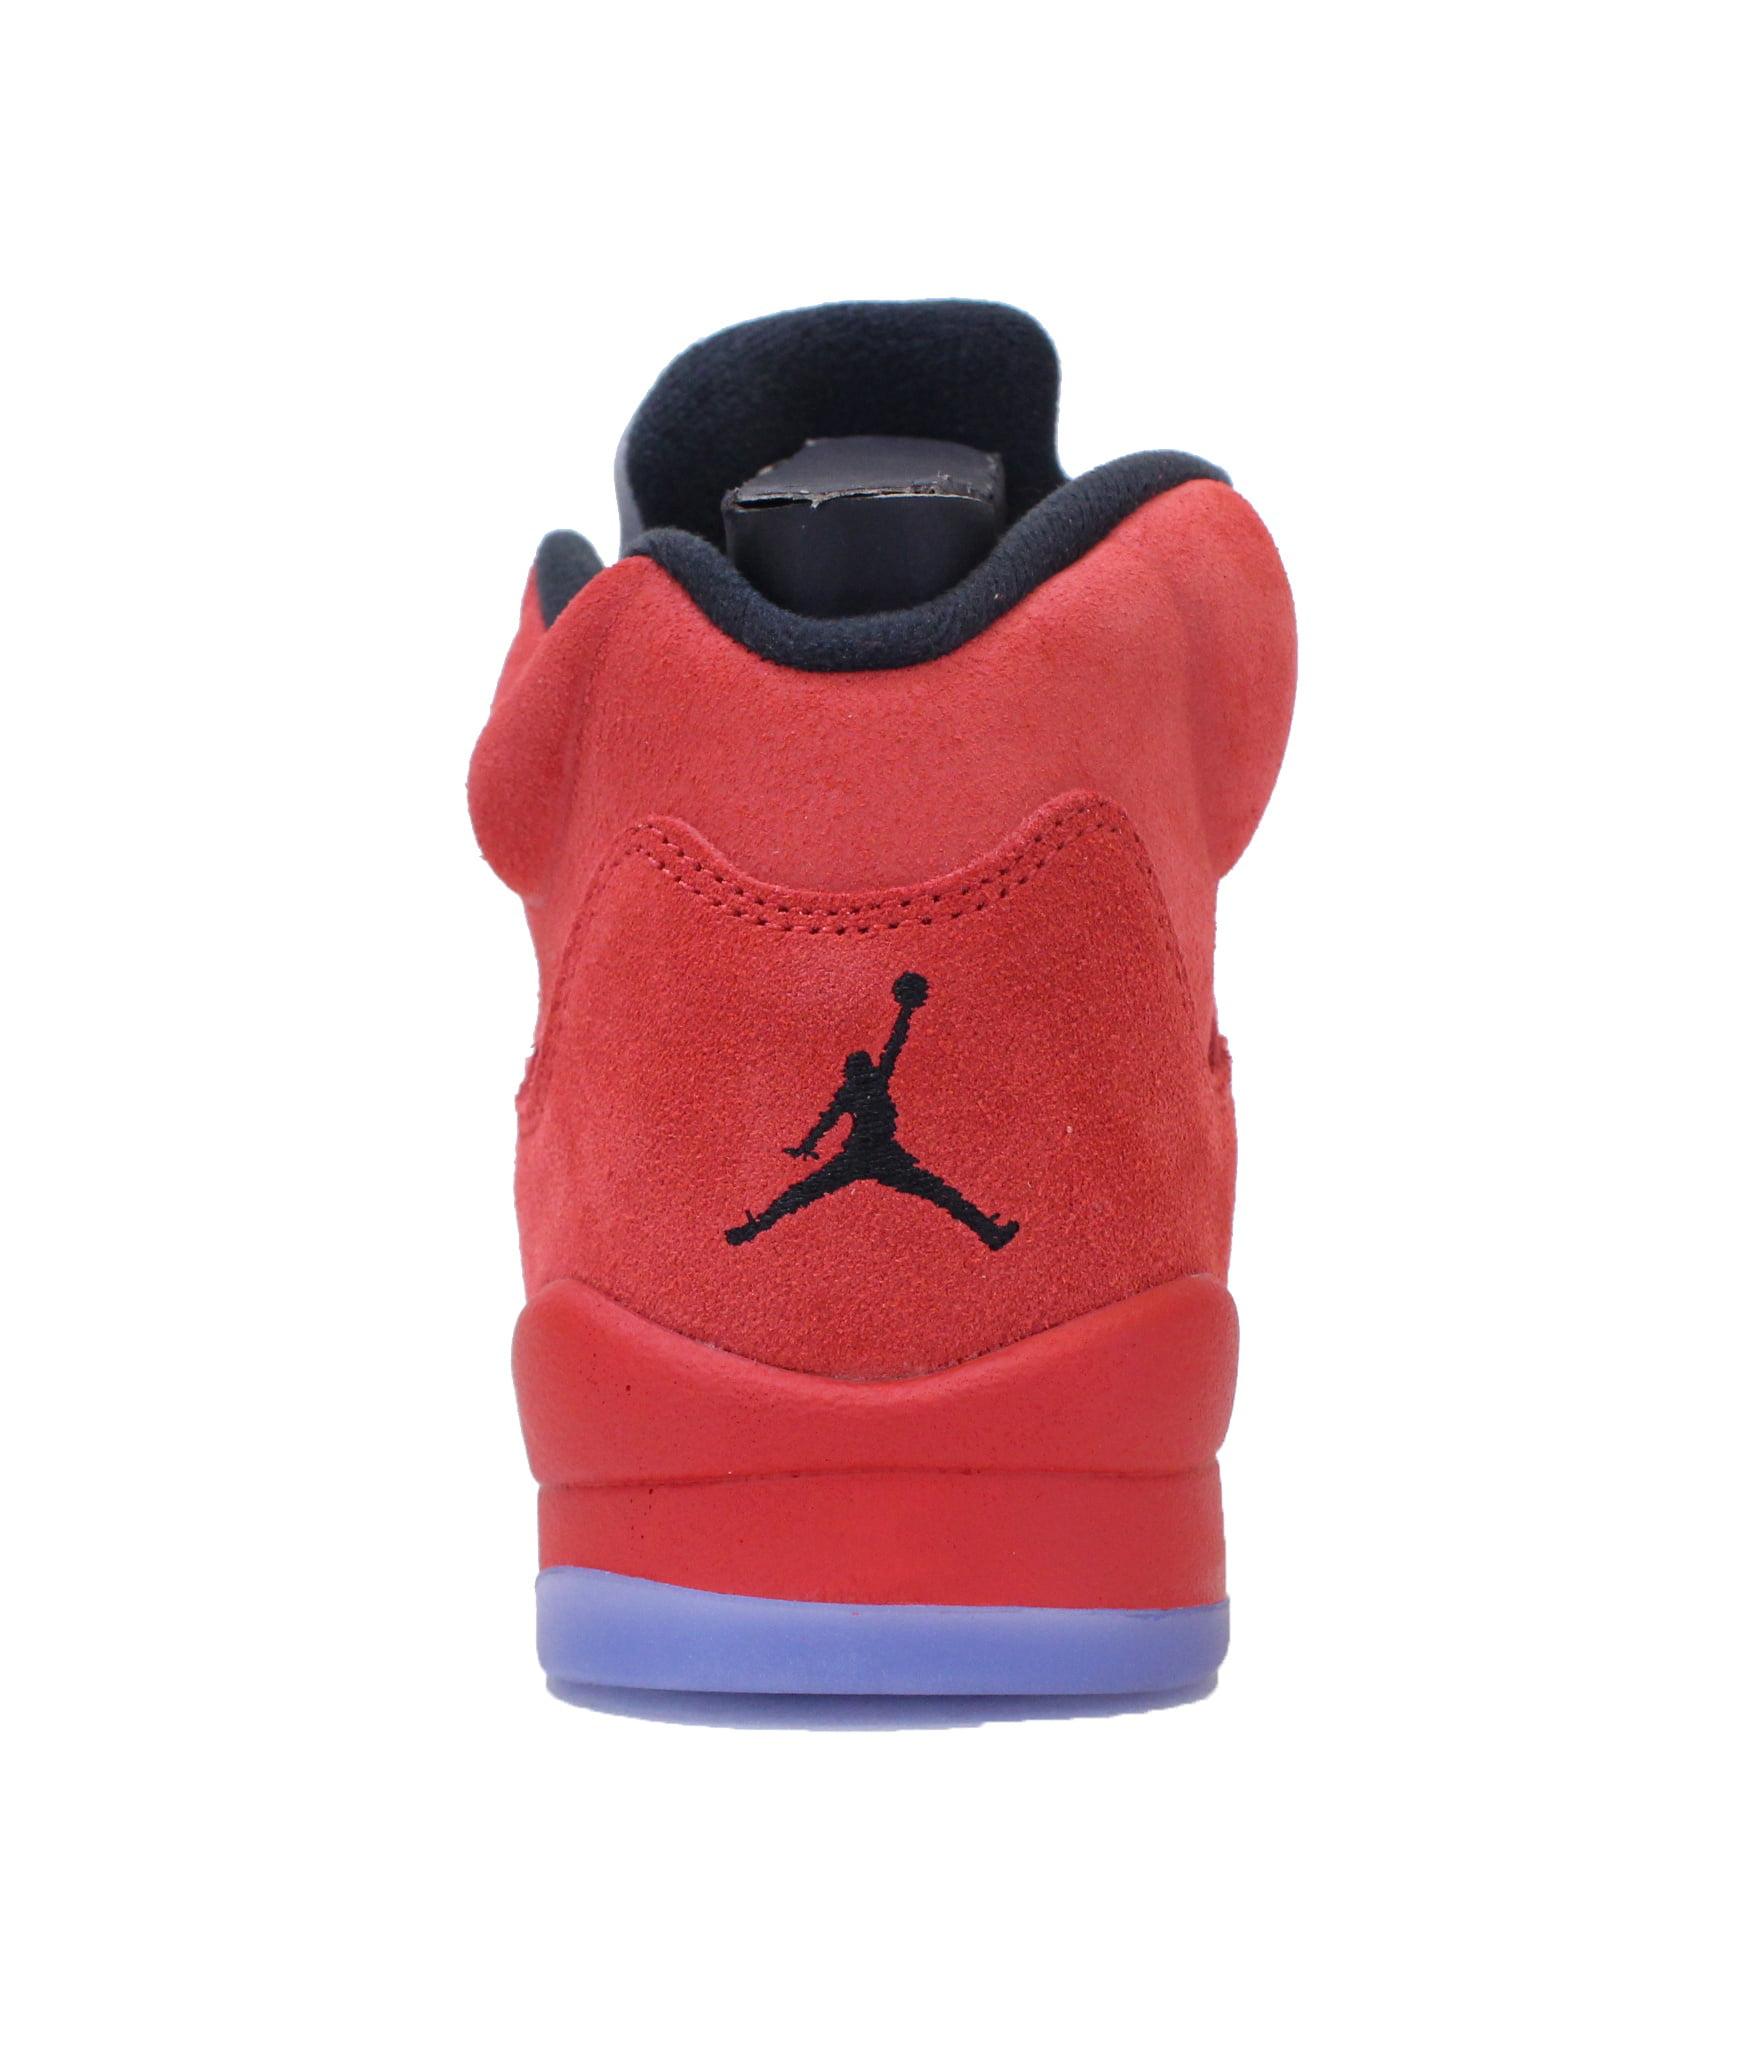 9754783d51d2 Jordan - AIR JORDAN 5 RETRO BG (GS)  RED SUEDE  - 440888-602 - Walmart.com